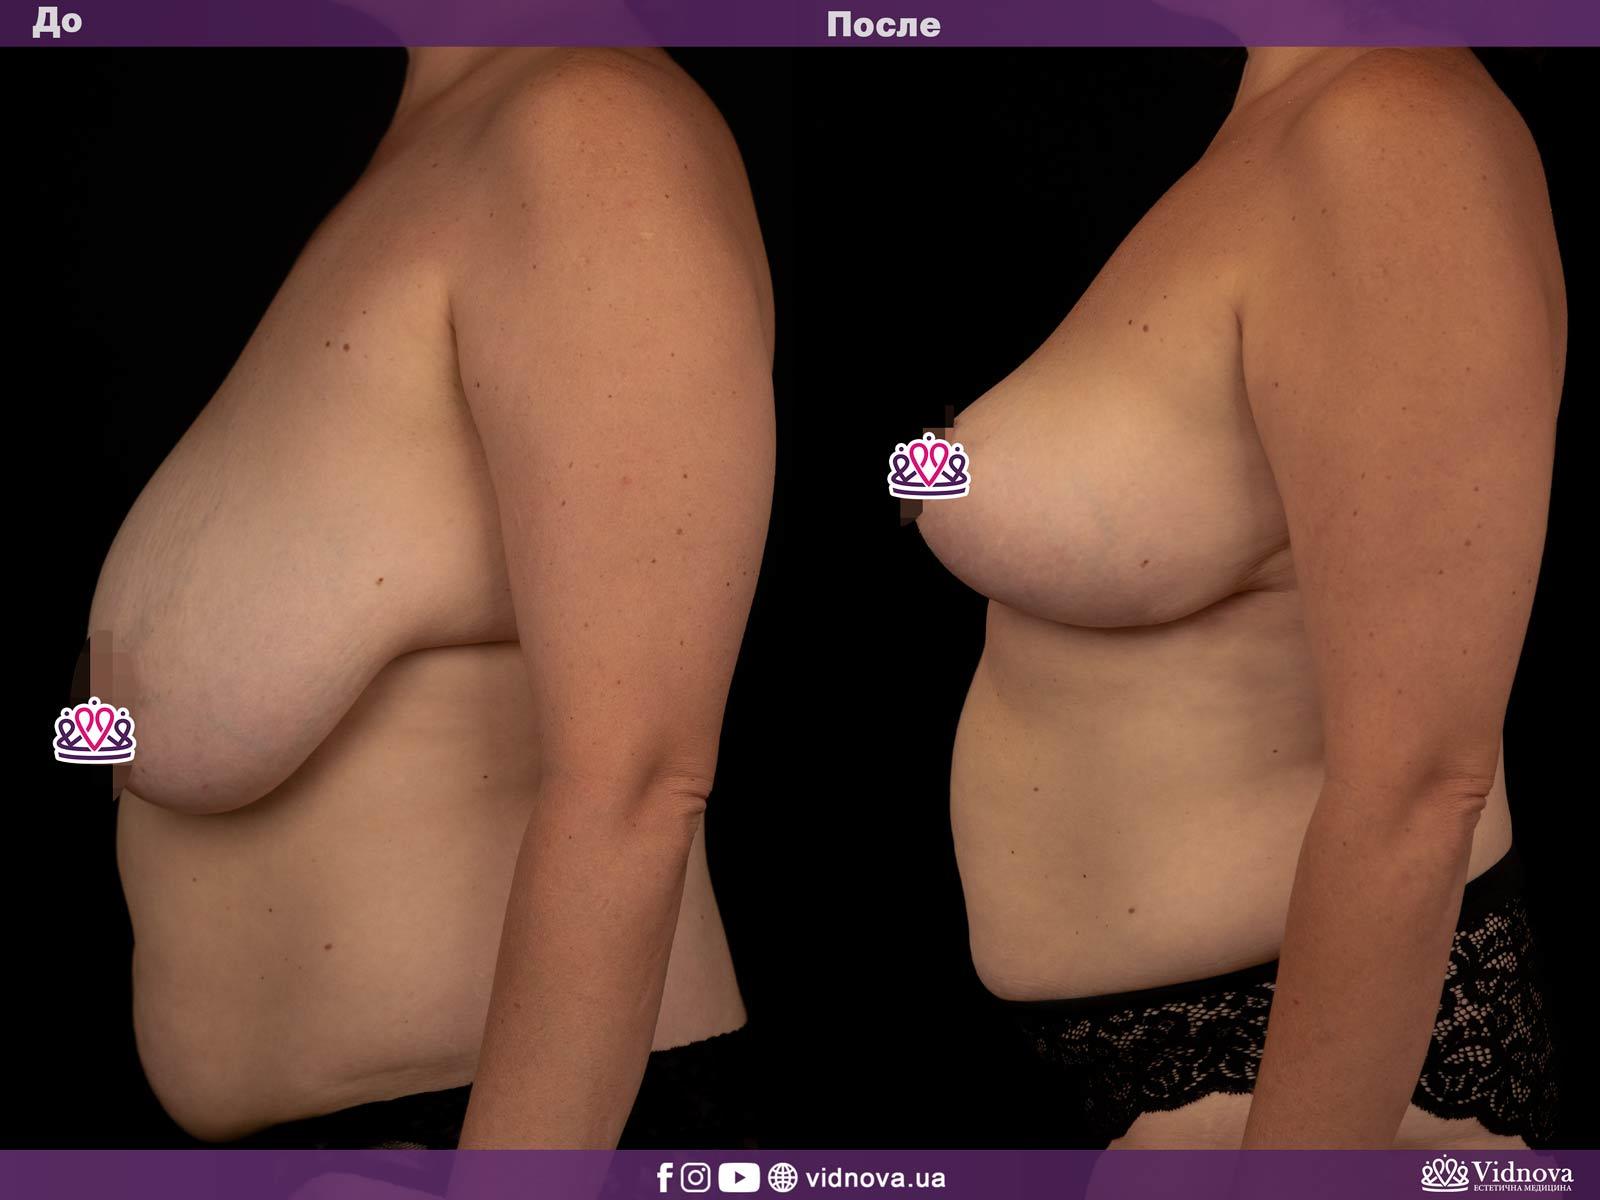 Уменьшение груди: Фото ДО и ПОСЛЕ - Пример №1-3 - Клиника Vidnova